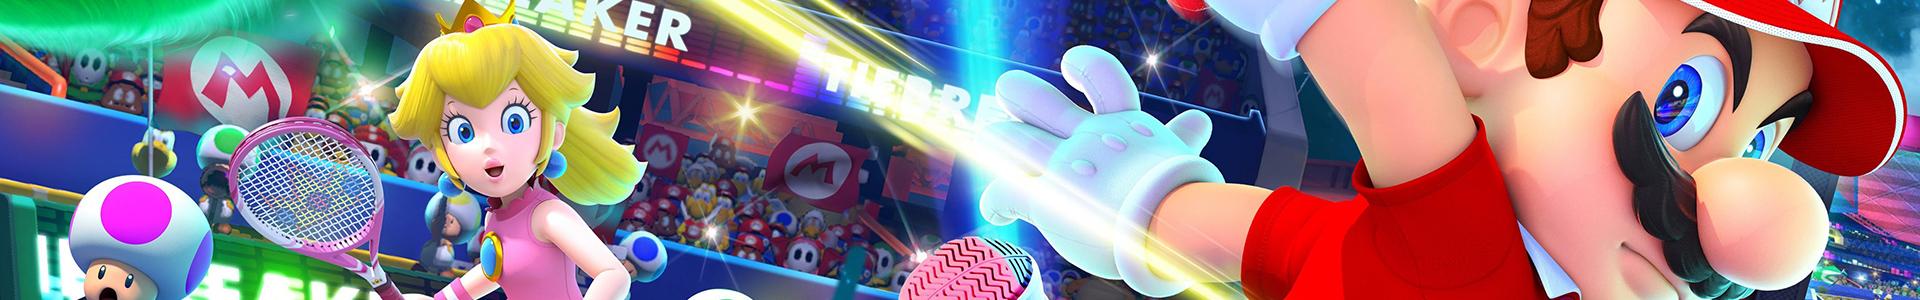 Banner media of Mario Tennis Aces video game.